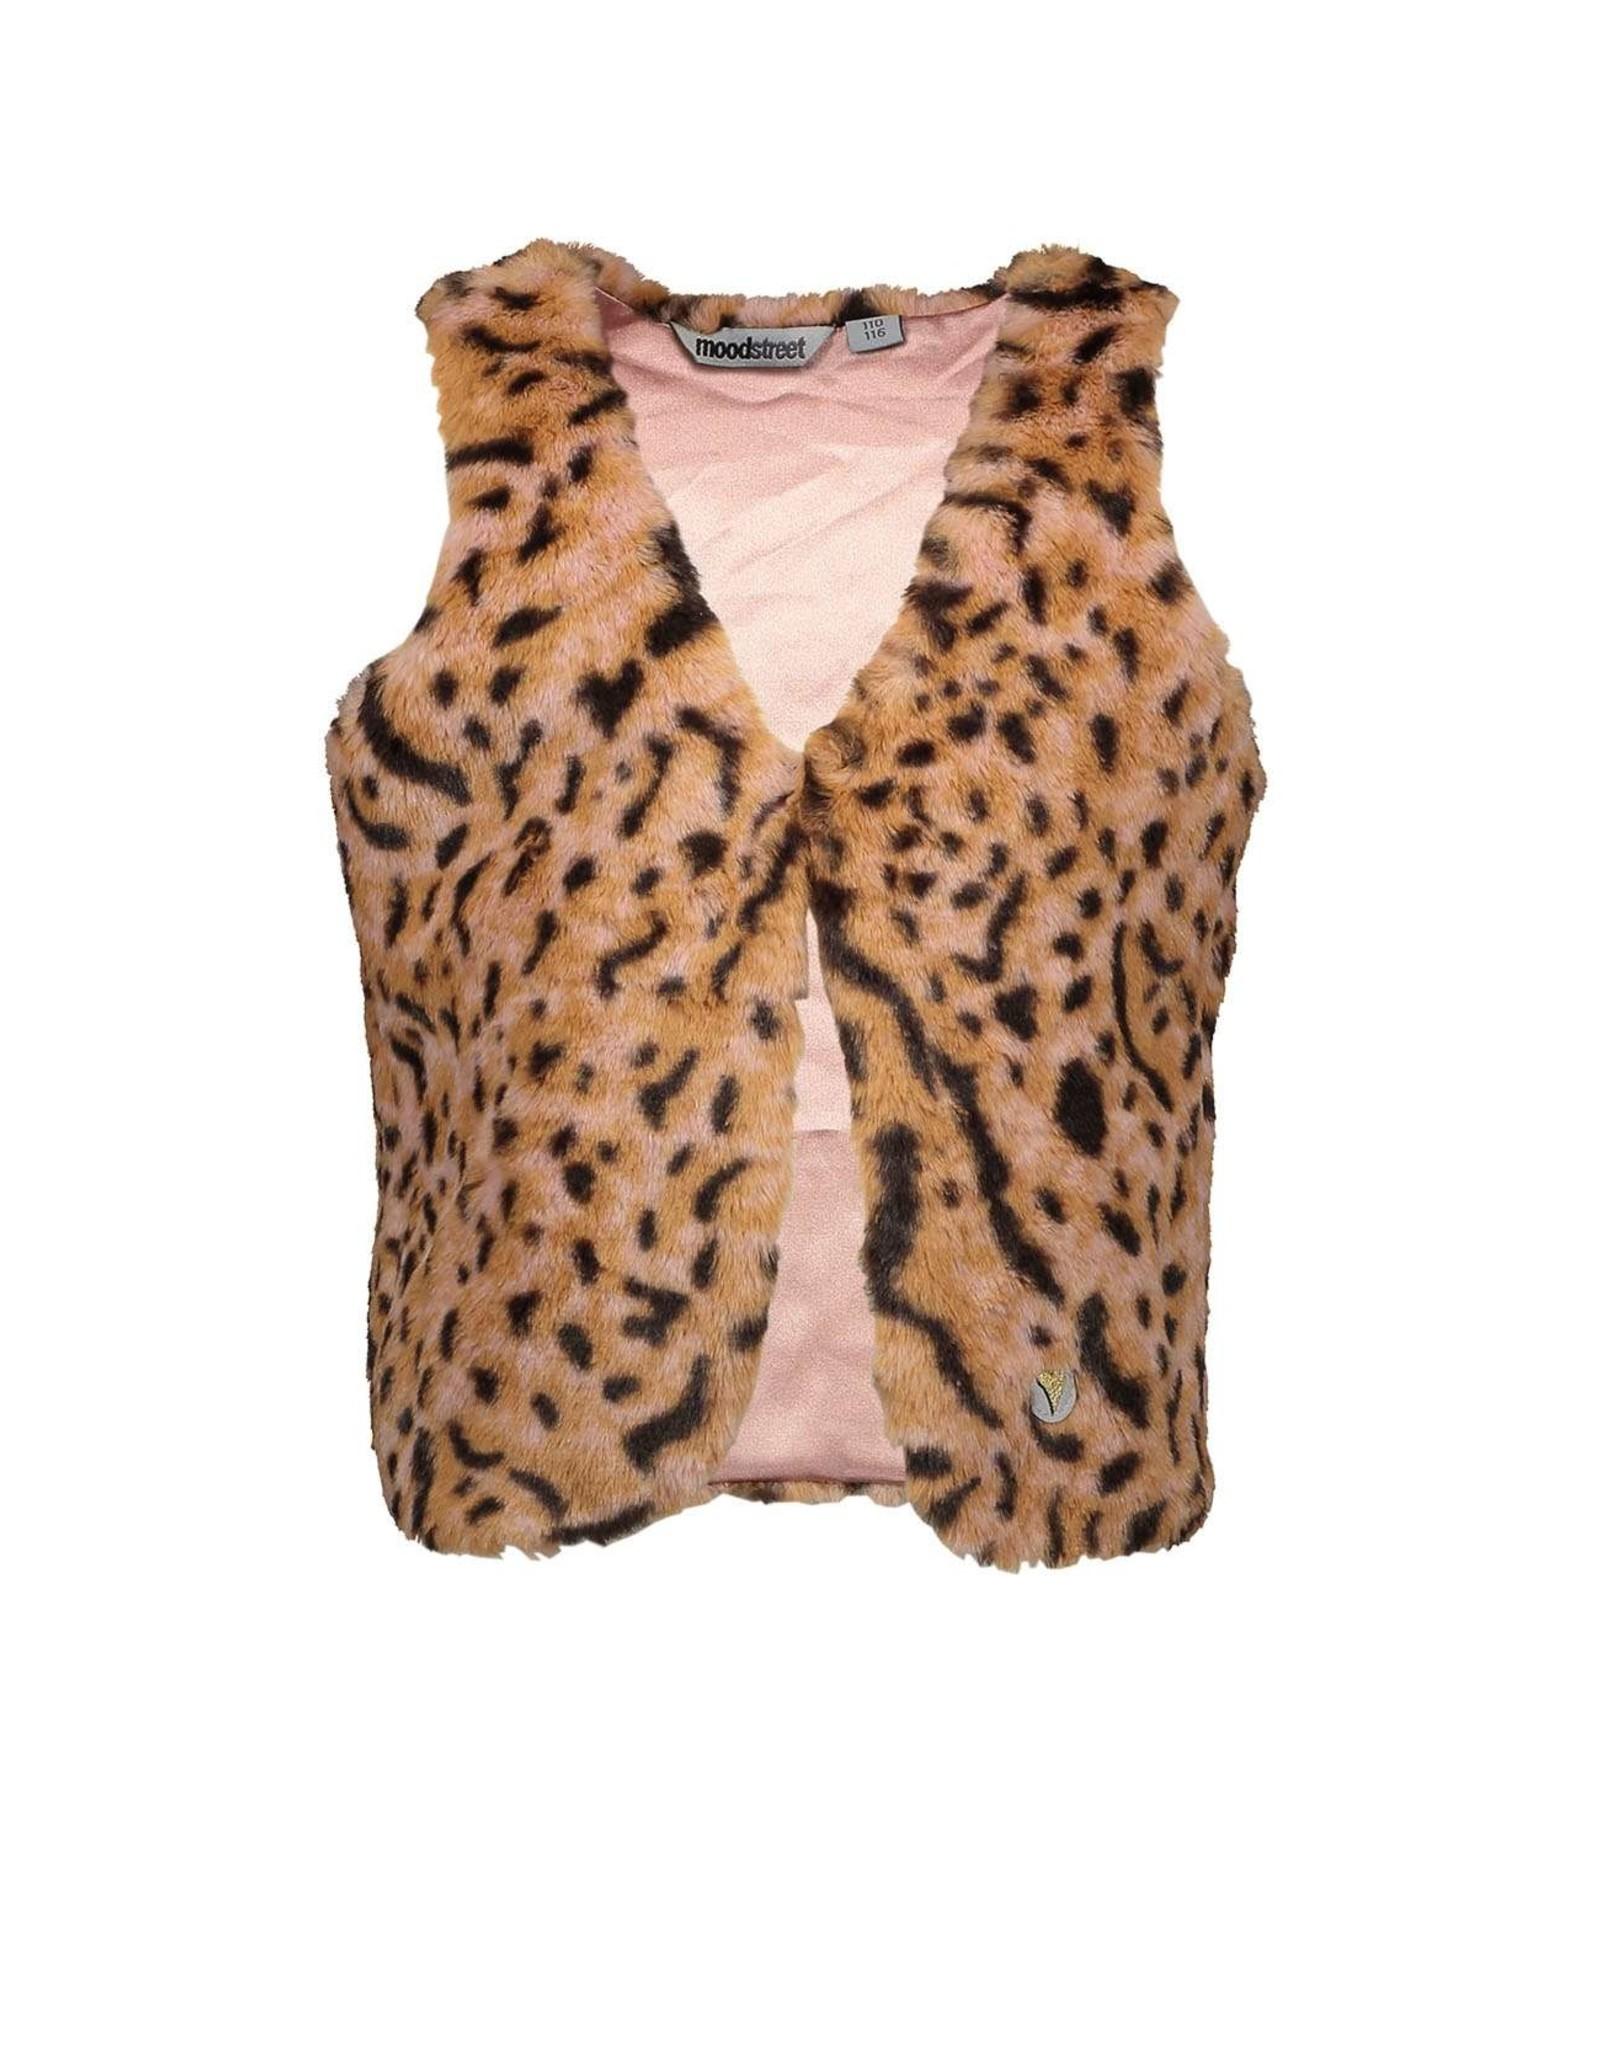 Moodstreet Moodstreet-MT Fake Fur Vest-Old Pink